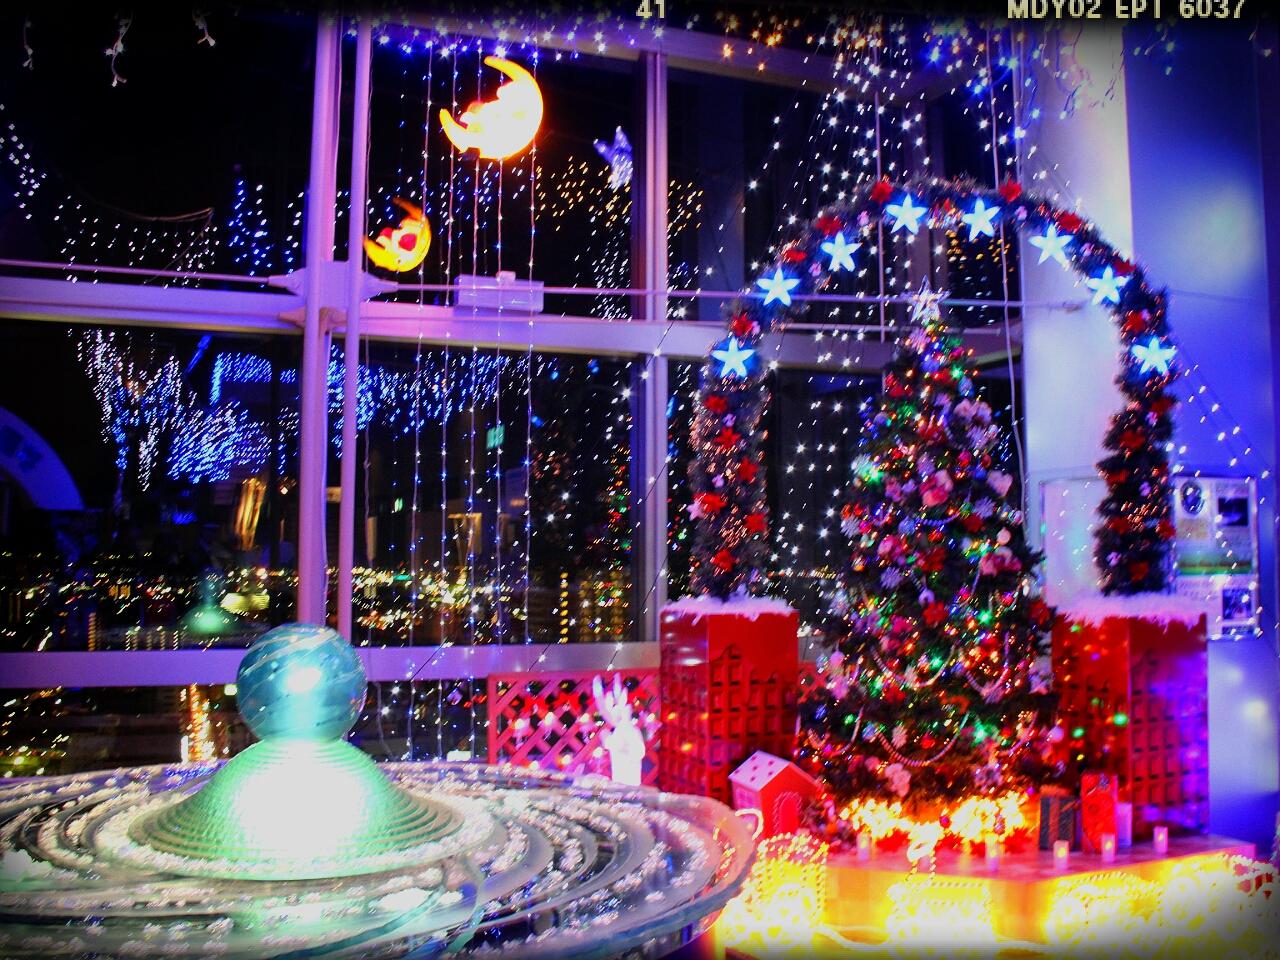 2012-12-25-23-06-43_deco.jpg